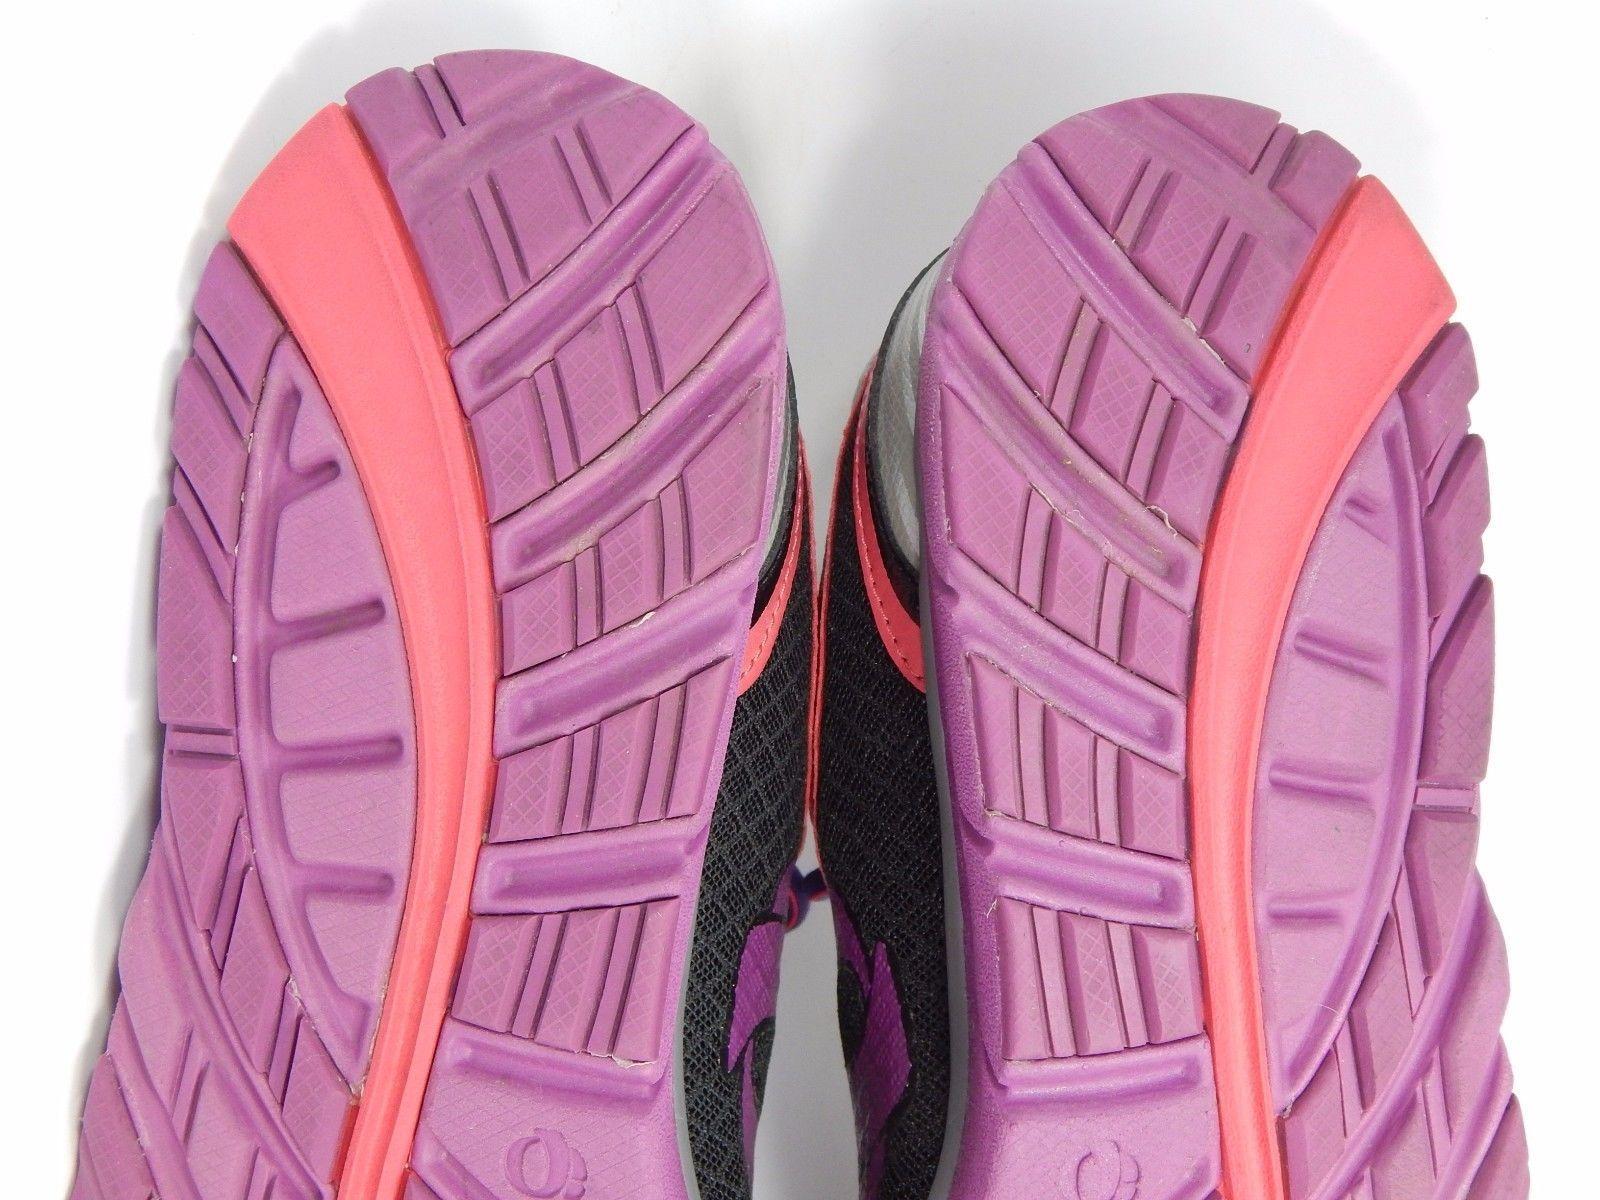 Pearl Izumi EM Road M 3 Women's Running Shoes Size US 8.5 M (B) EU 40 Silver